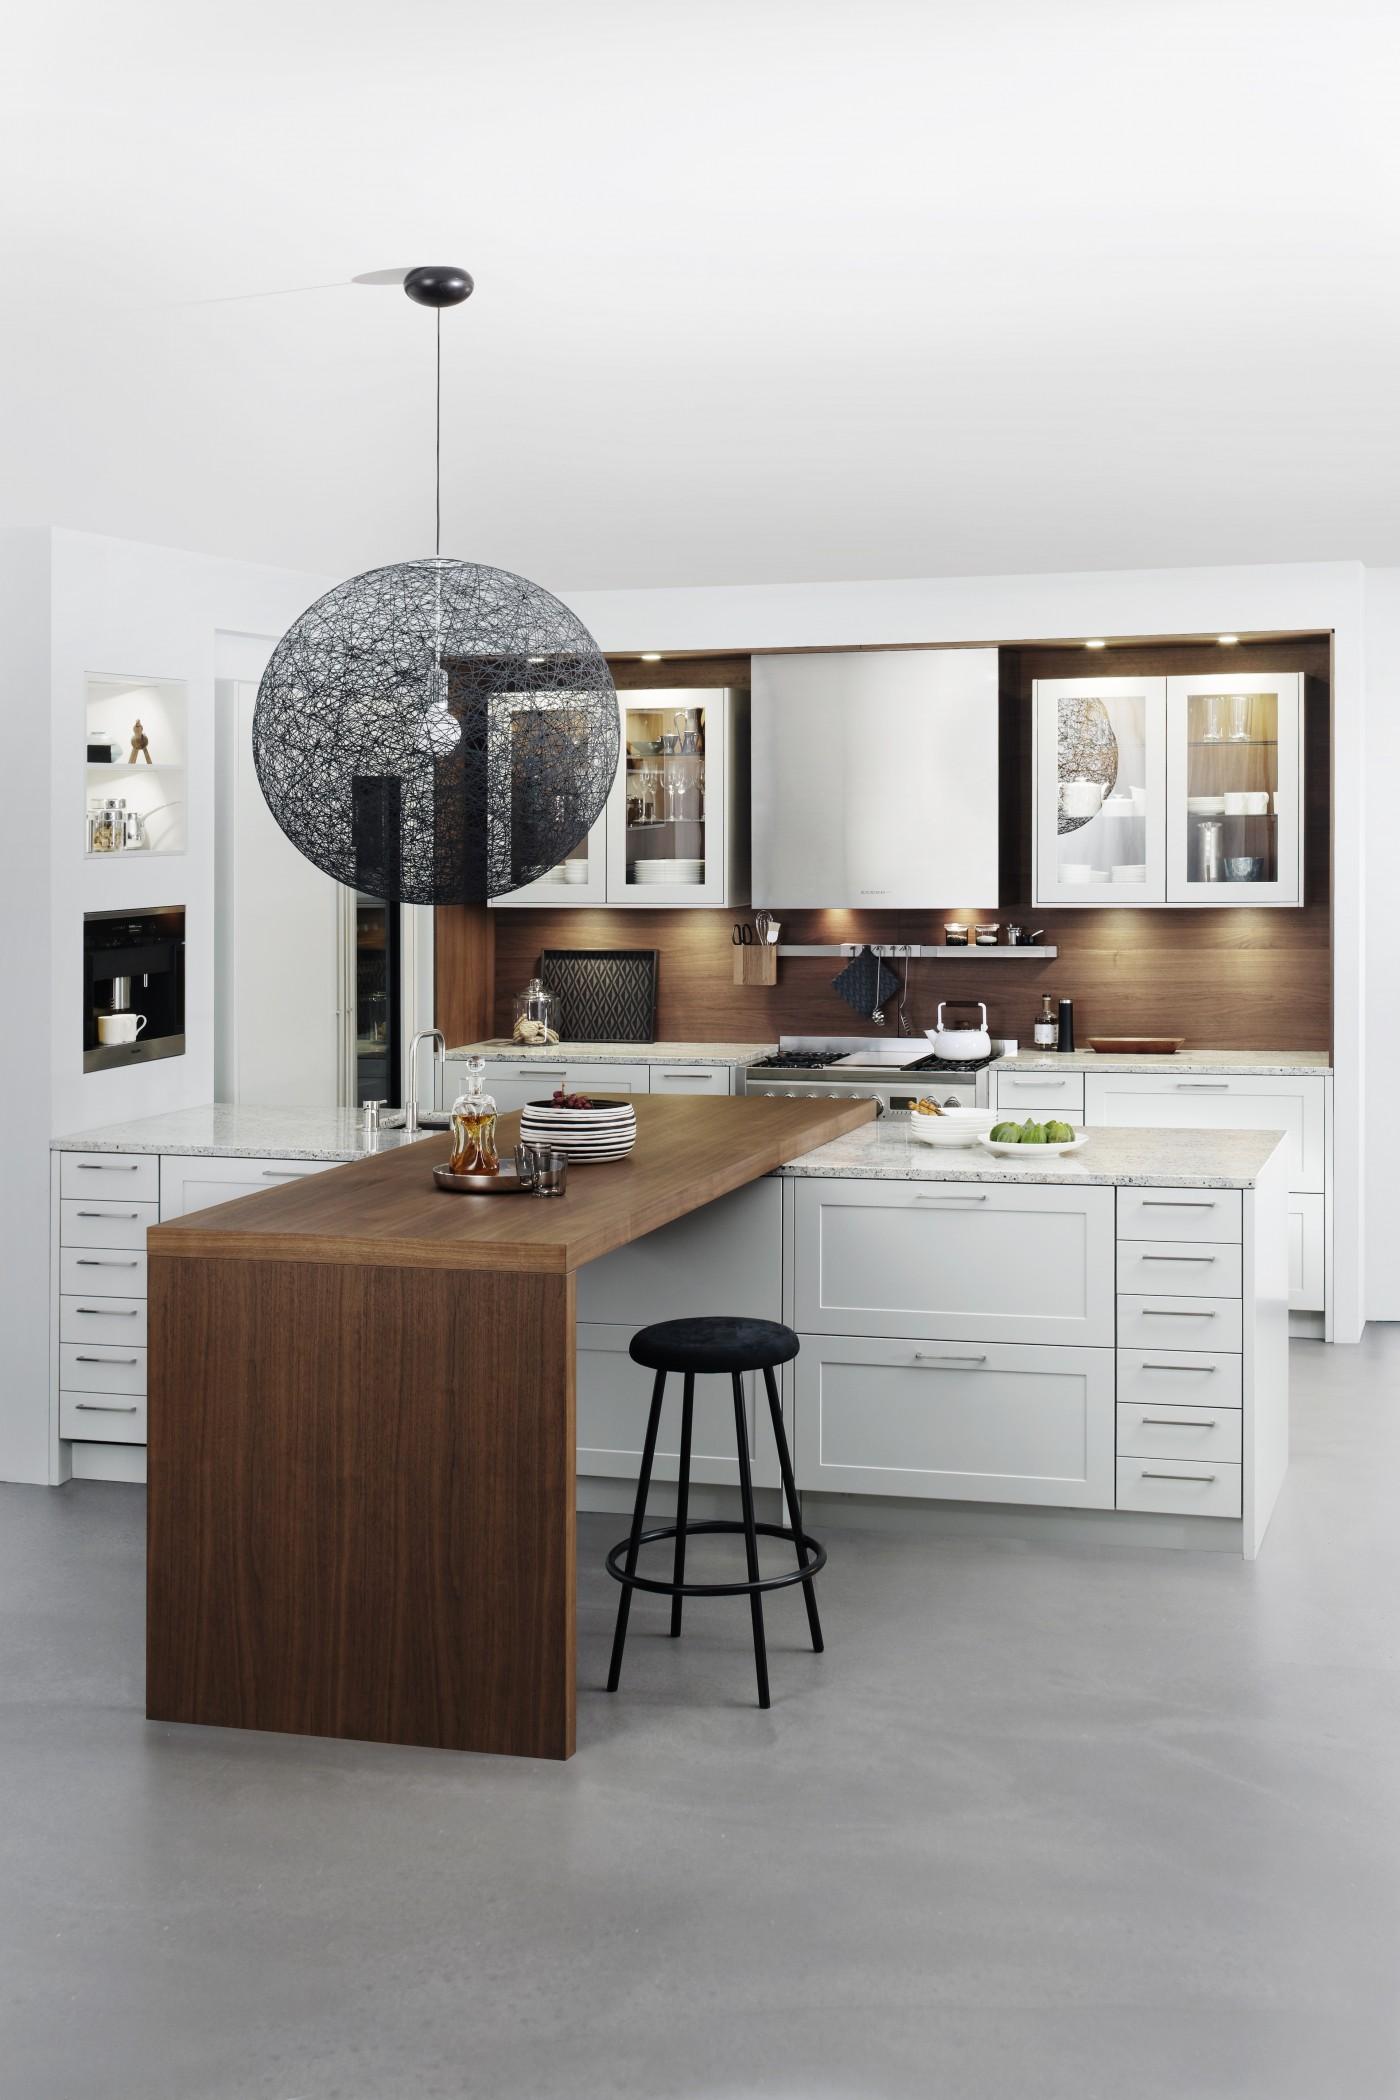 carr fs topos stylish leicht kitchen from elan kitchens london. Black Bedroom Furniture Sets. Home Design Ideas